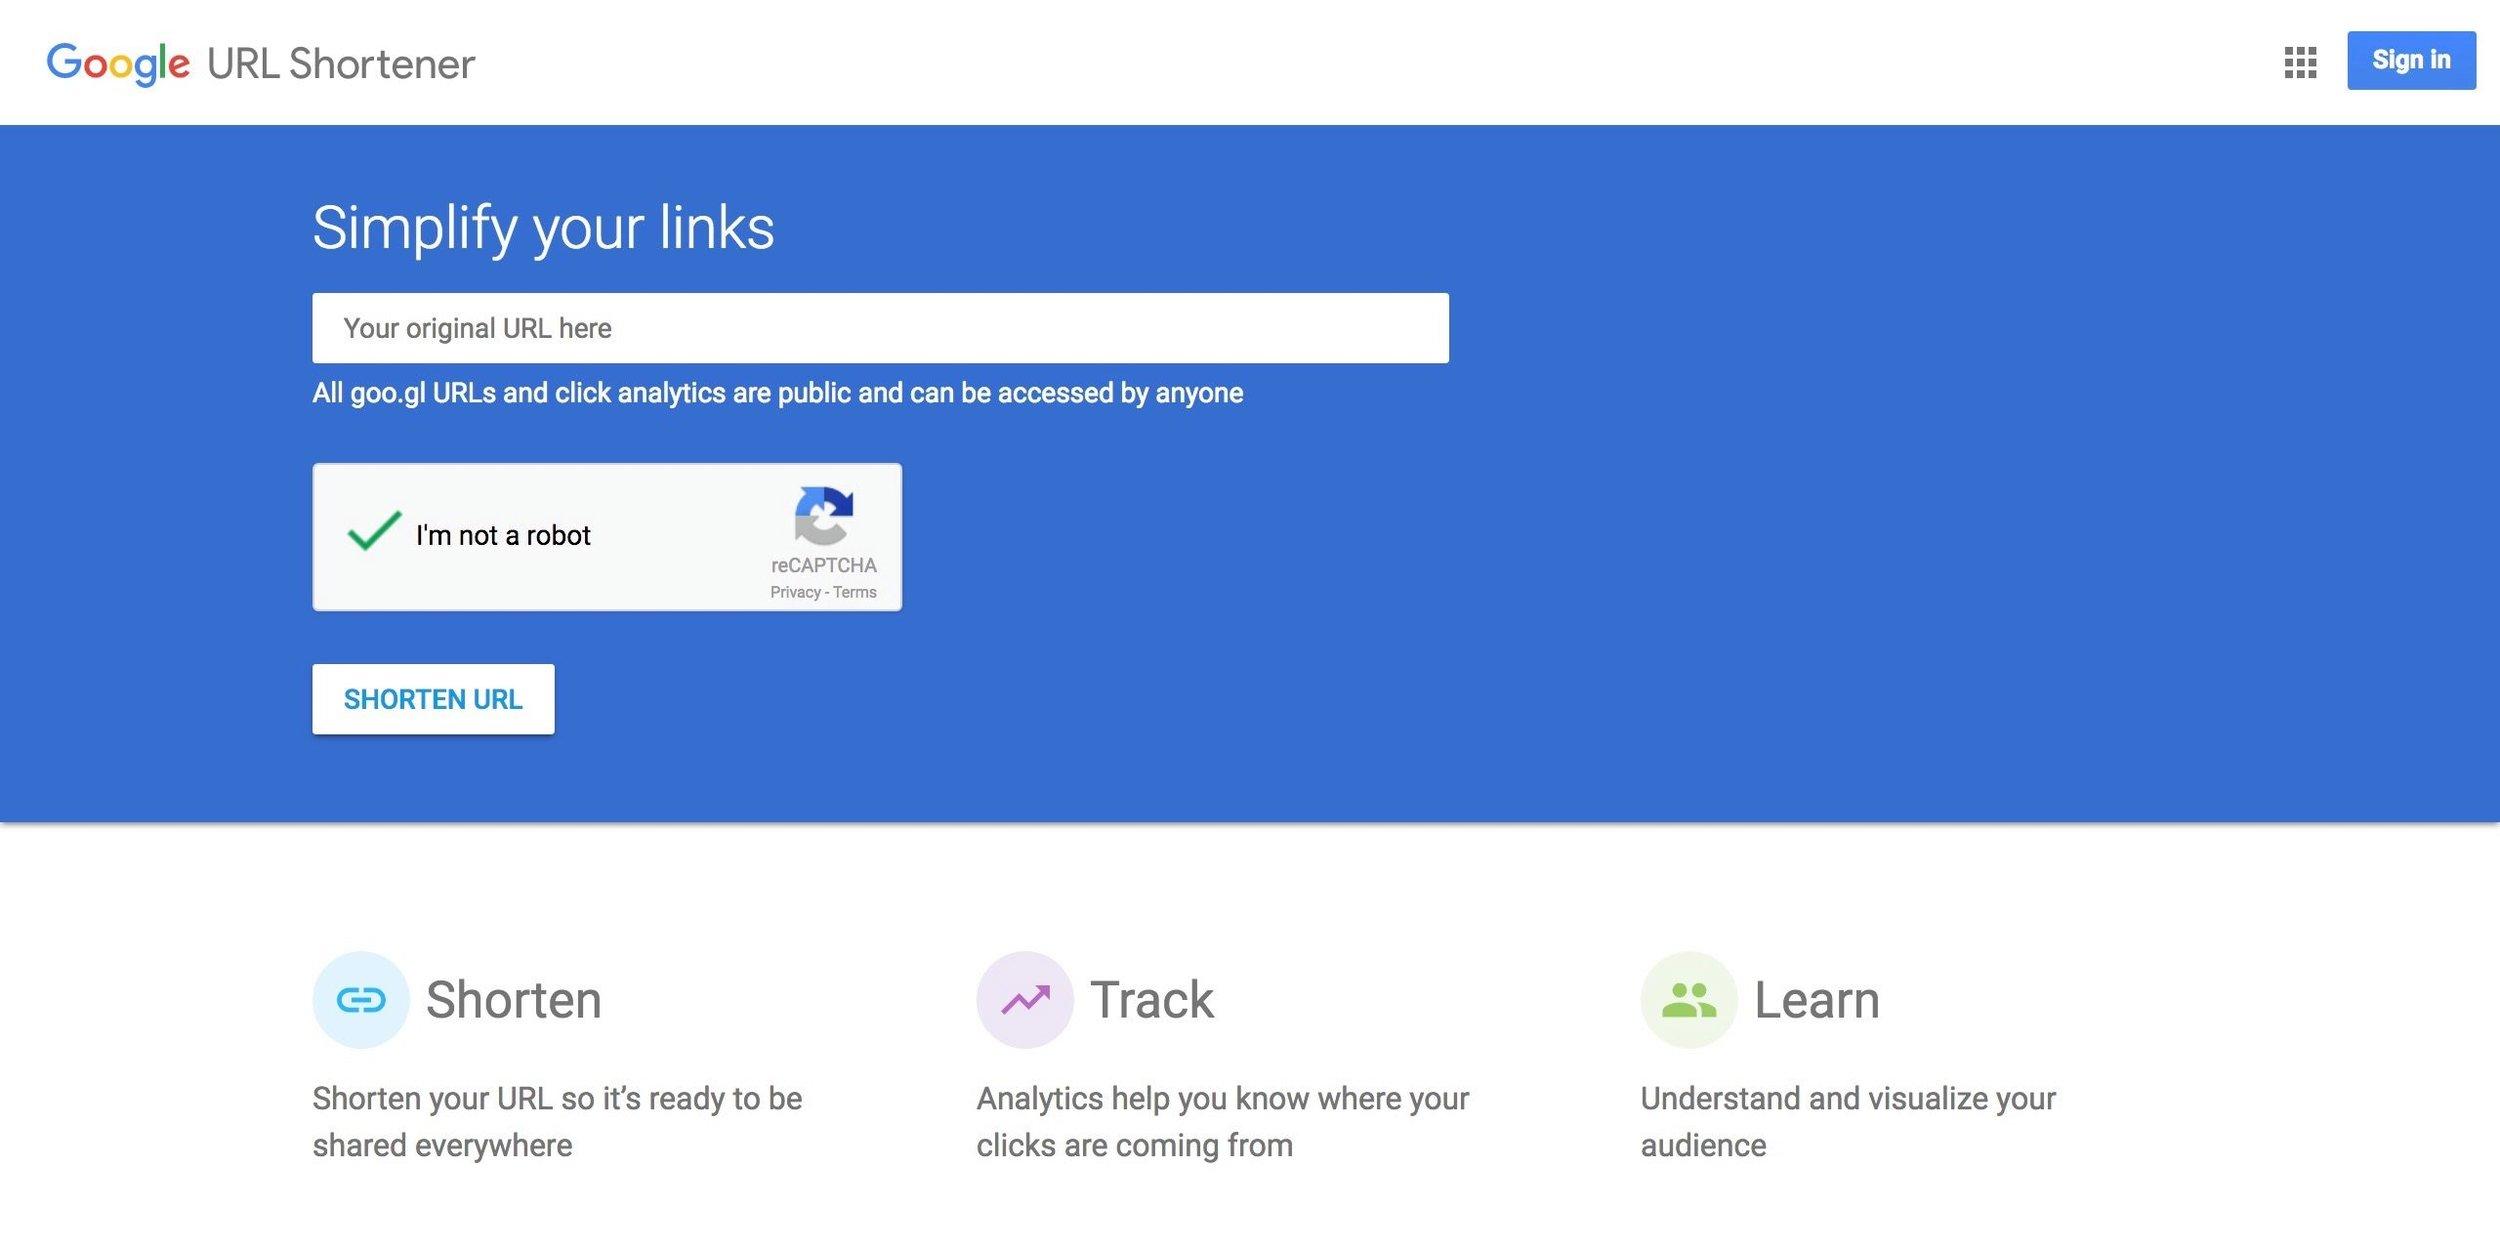 google-url-shortener.jpg